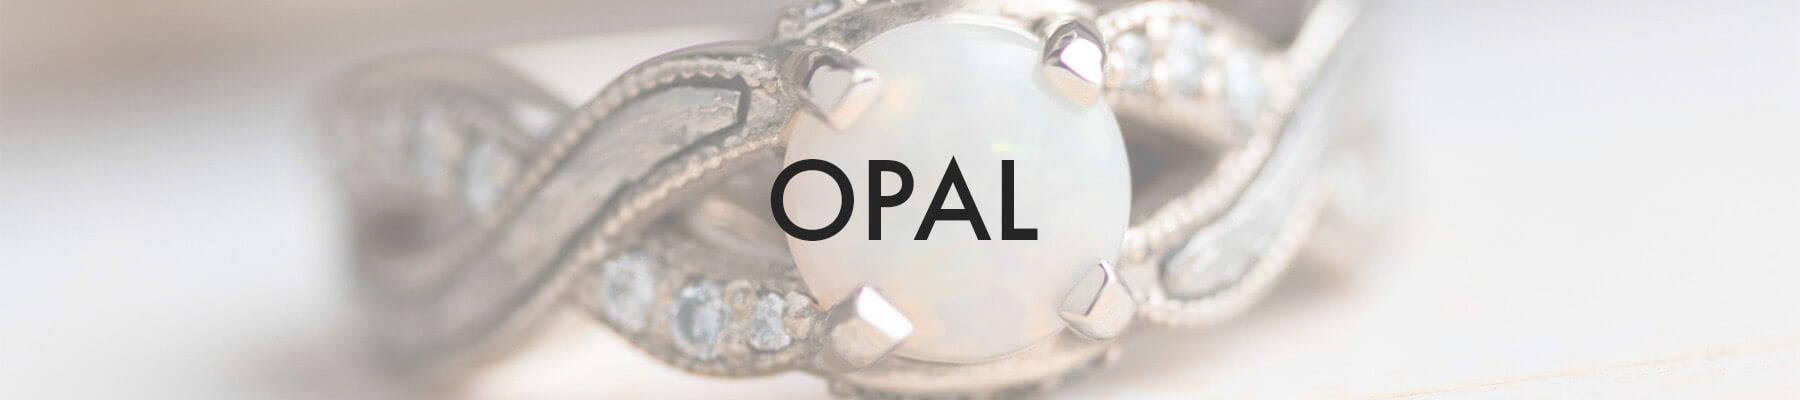 Opal Engagement Ring (SKU 3678)